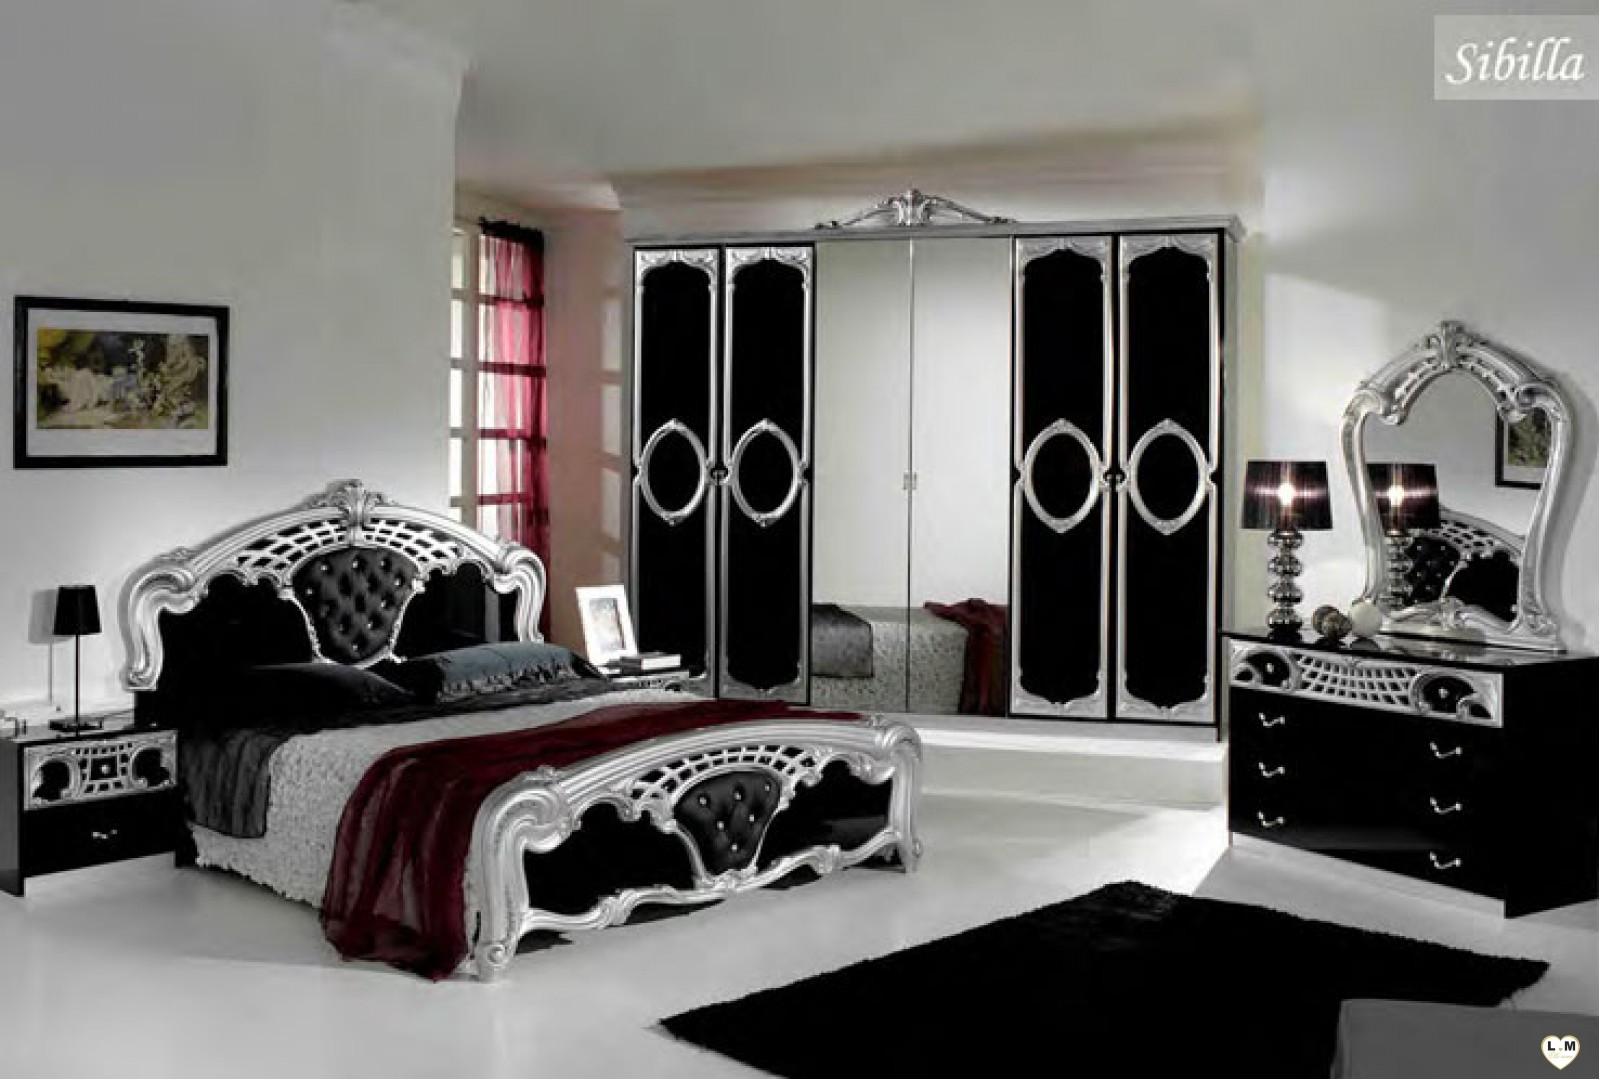 Sibilla 6 portes noir et argent ensemble chambre a coucher - Italienisches schlafzimmer ...